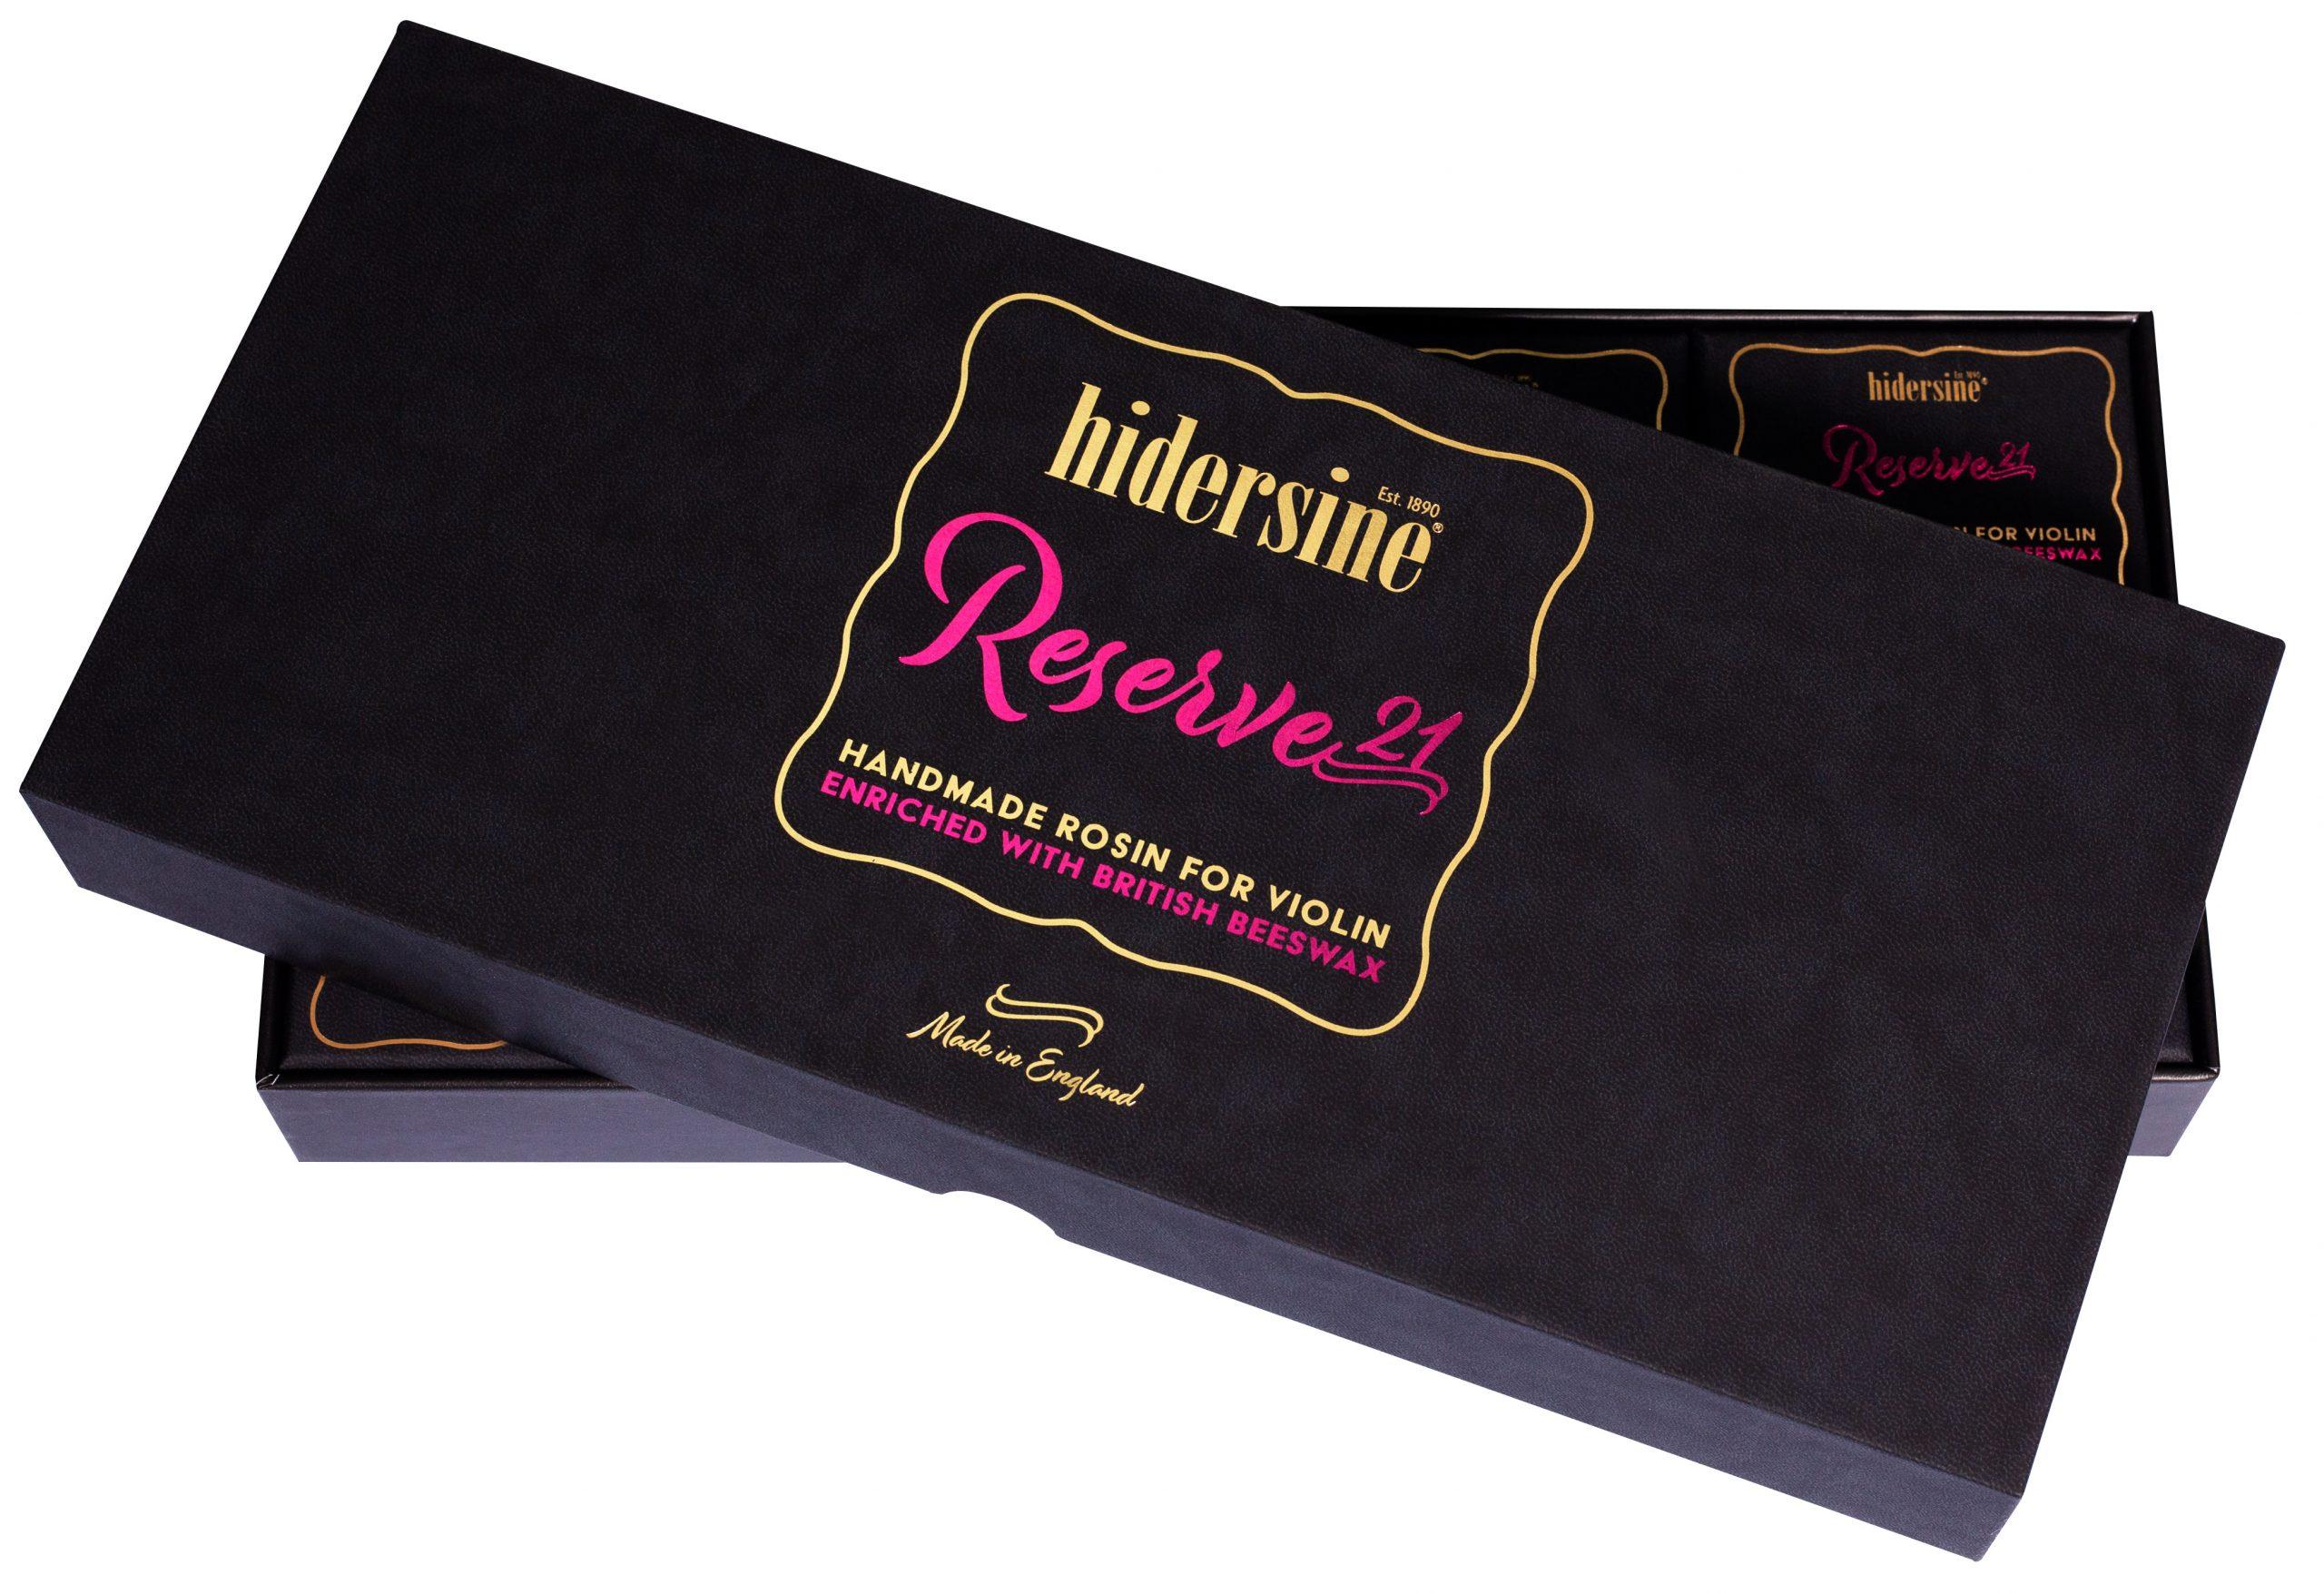 Hidersine Reserve 21 Violin Box of 8